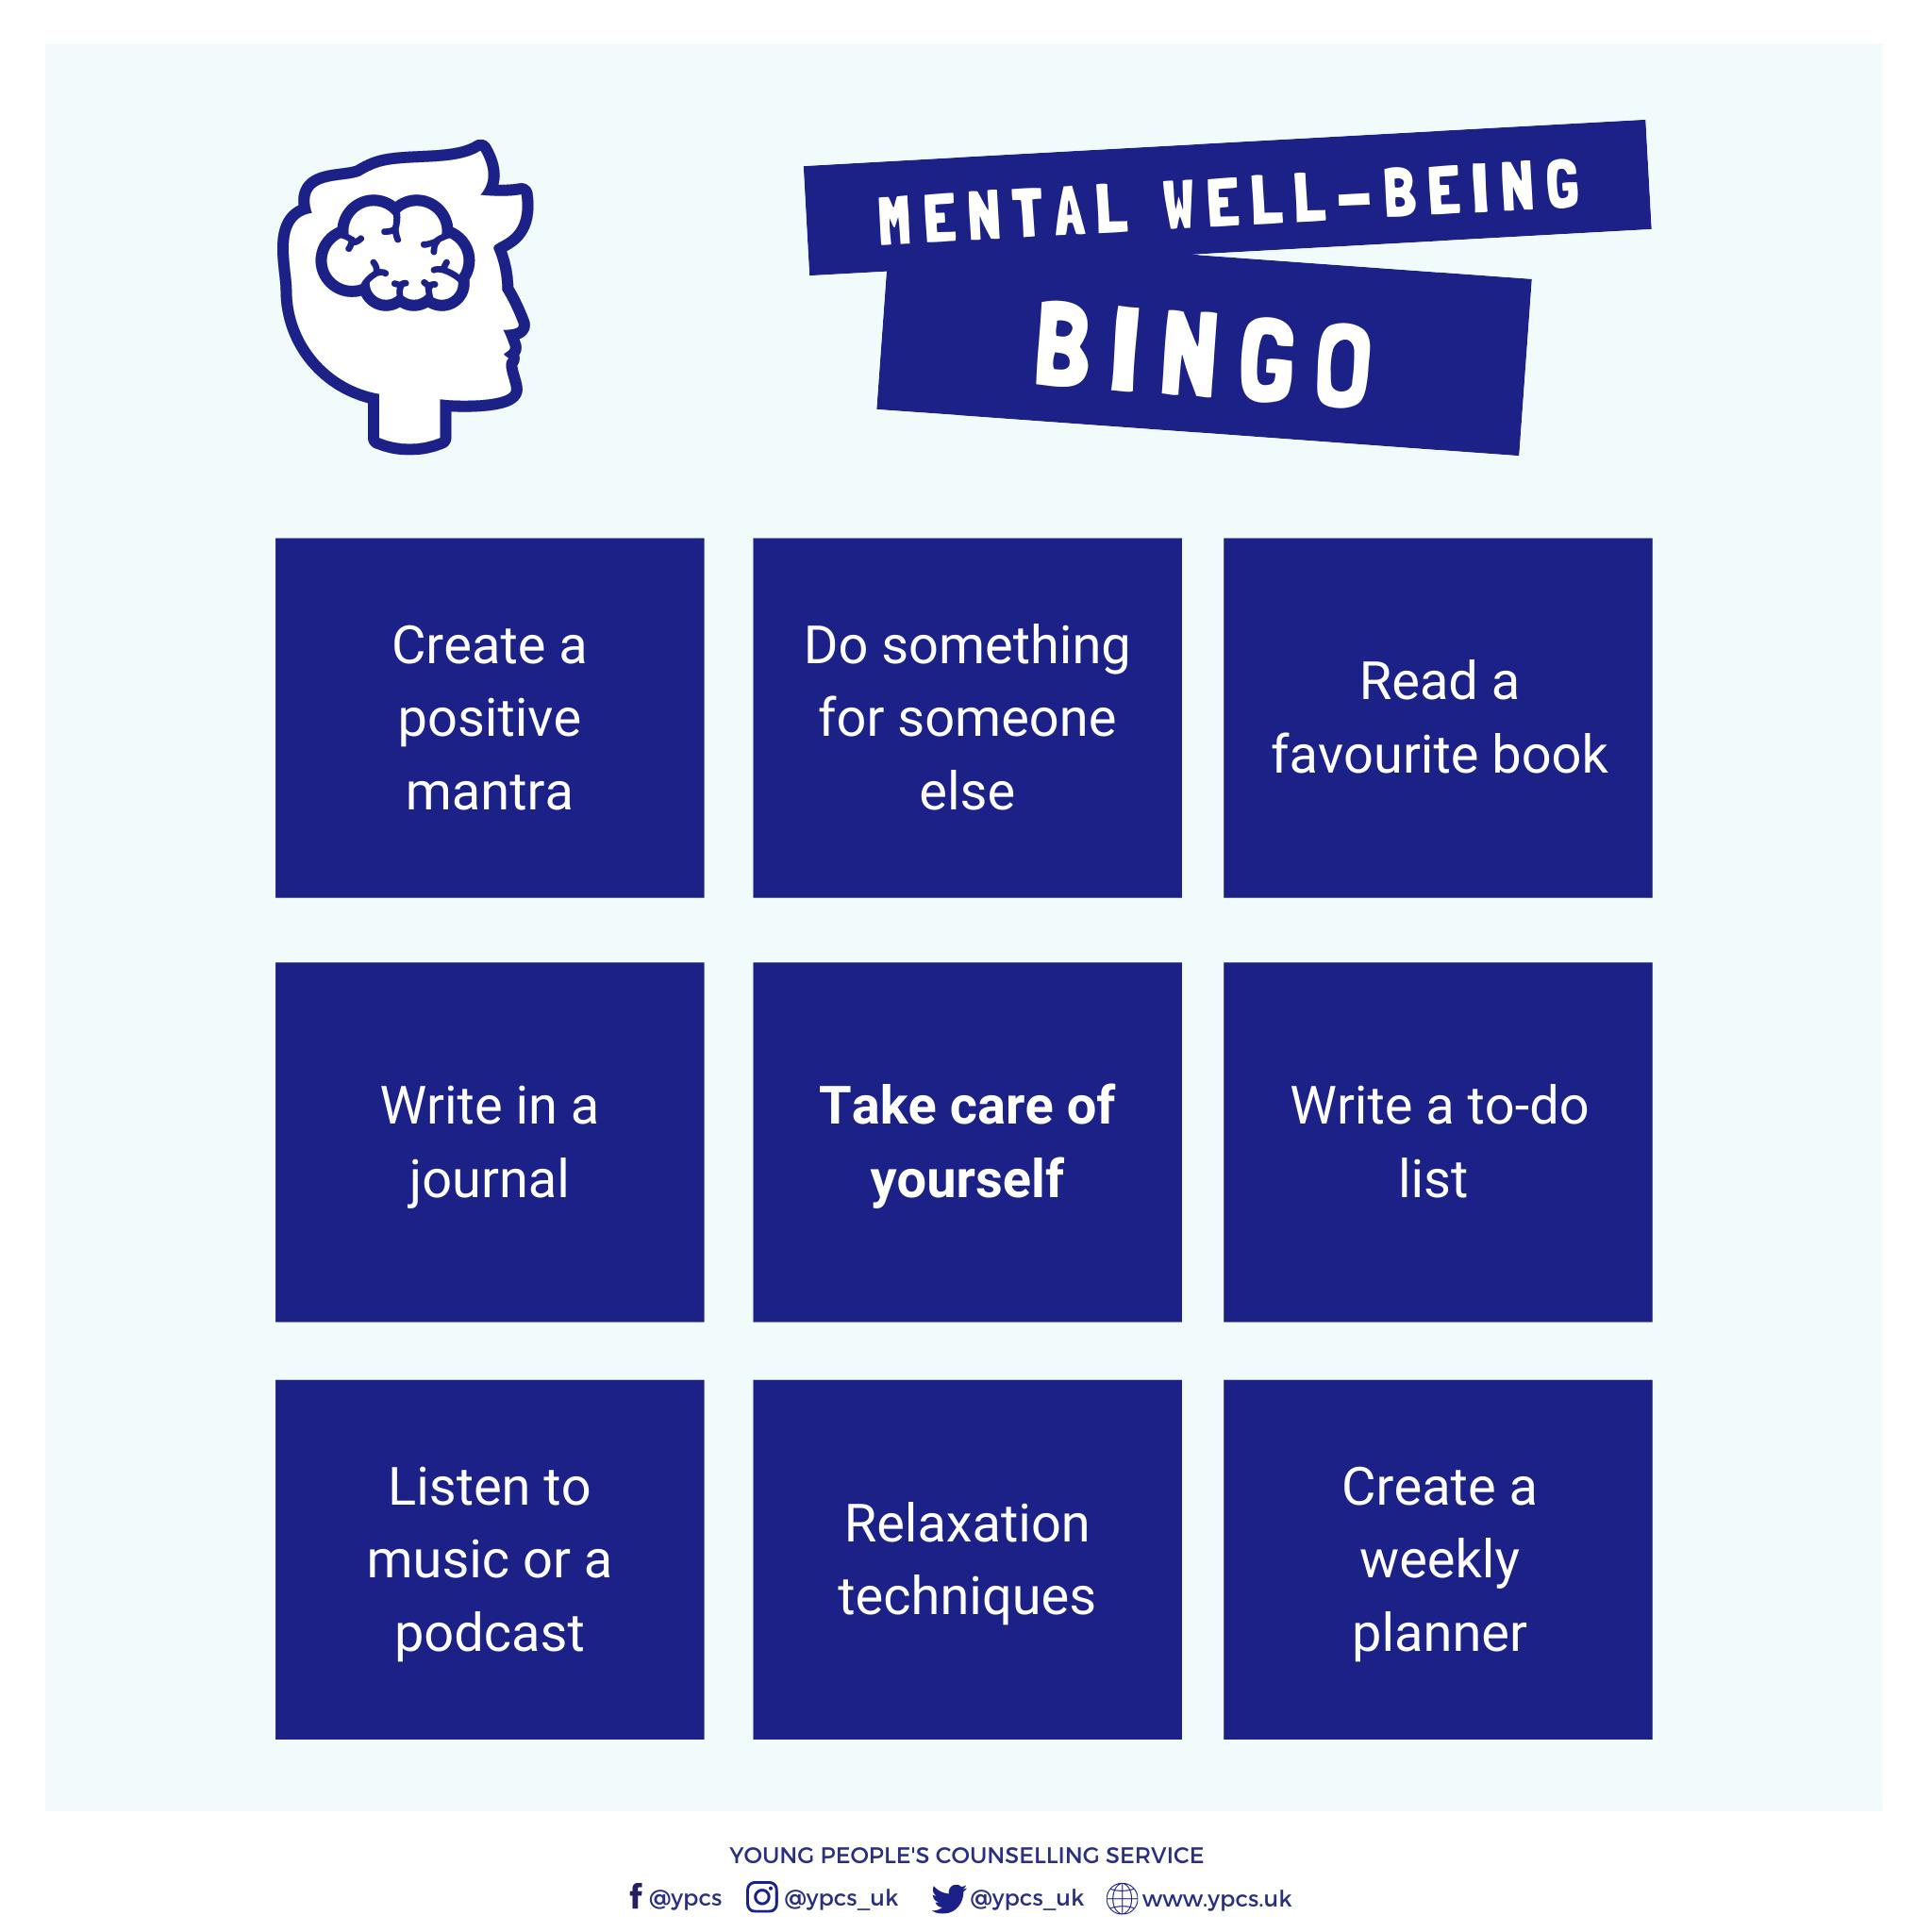 Mental Well-Being Bingo